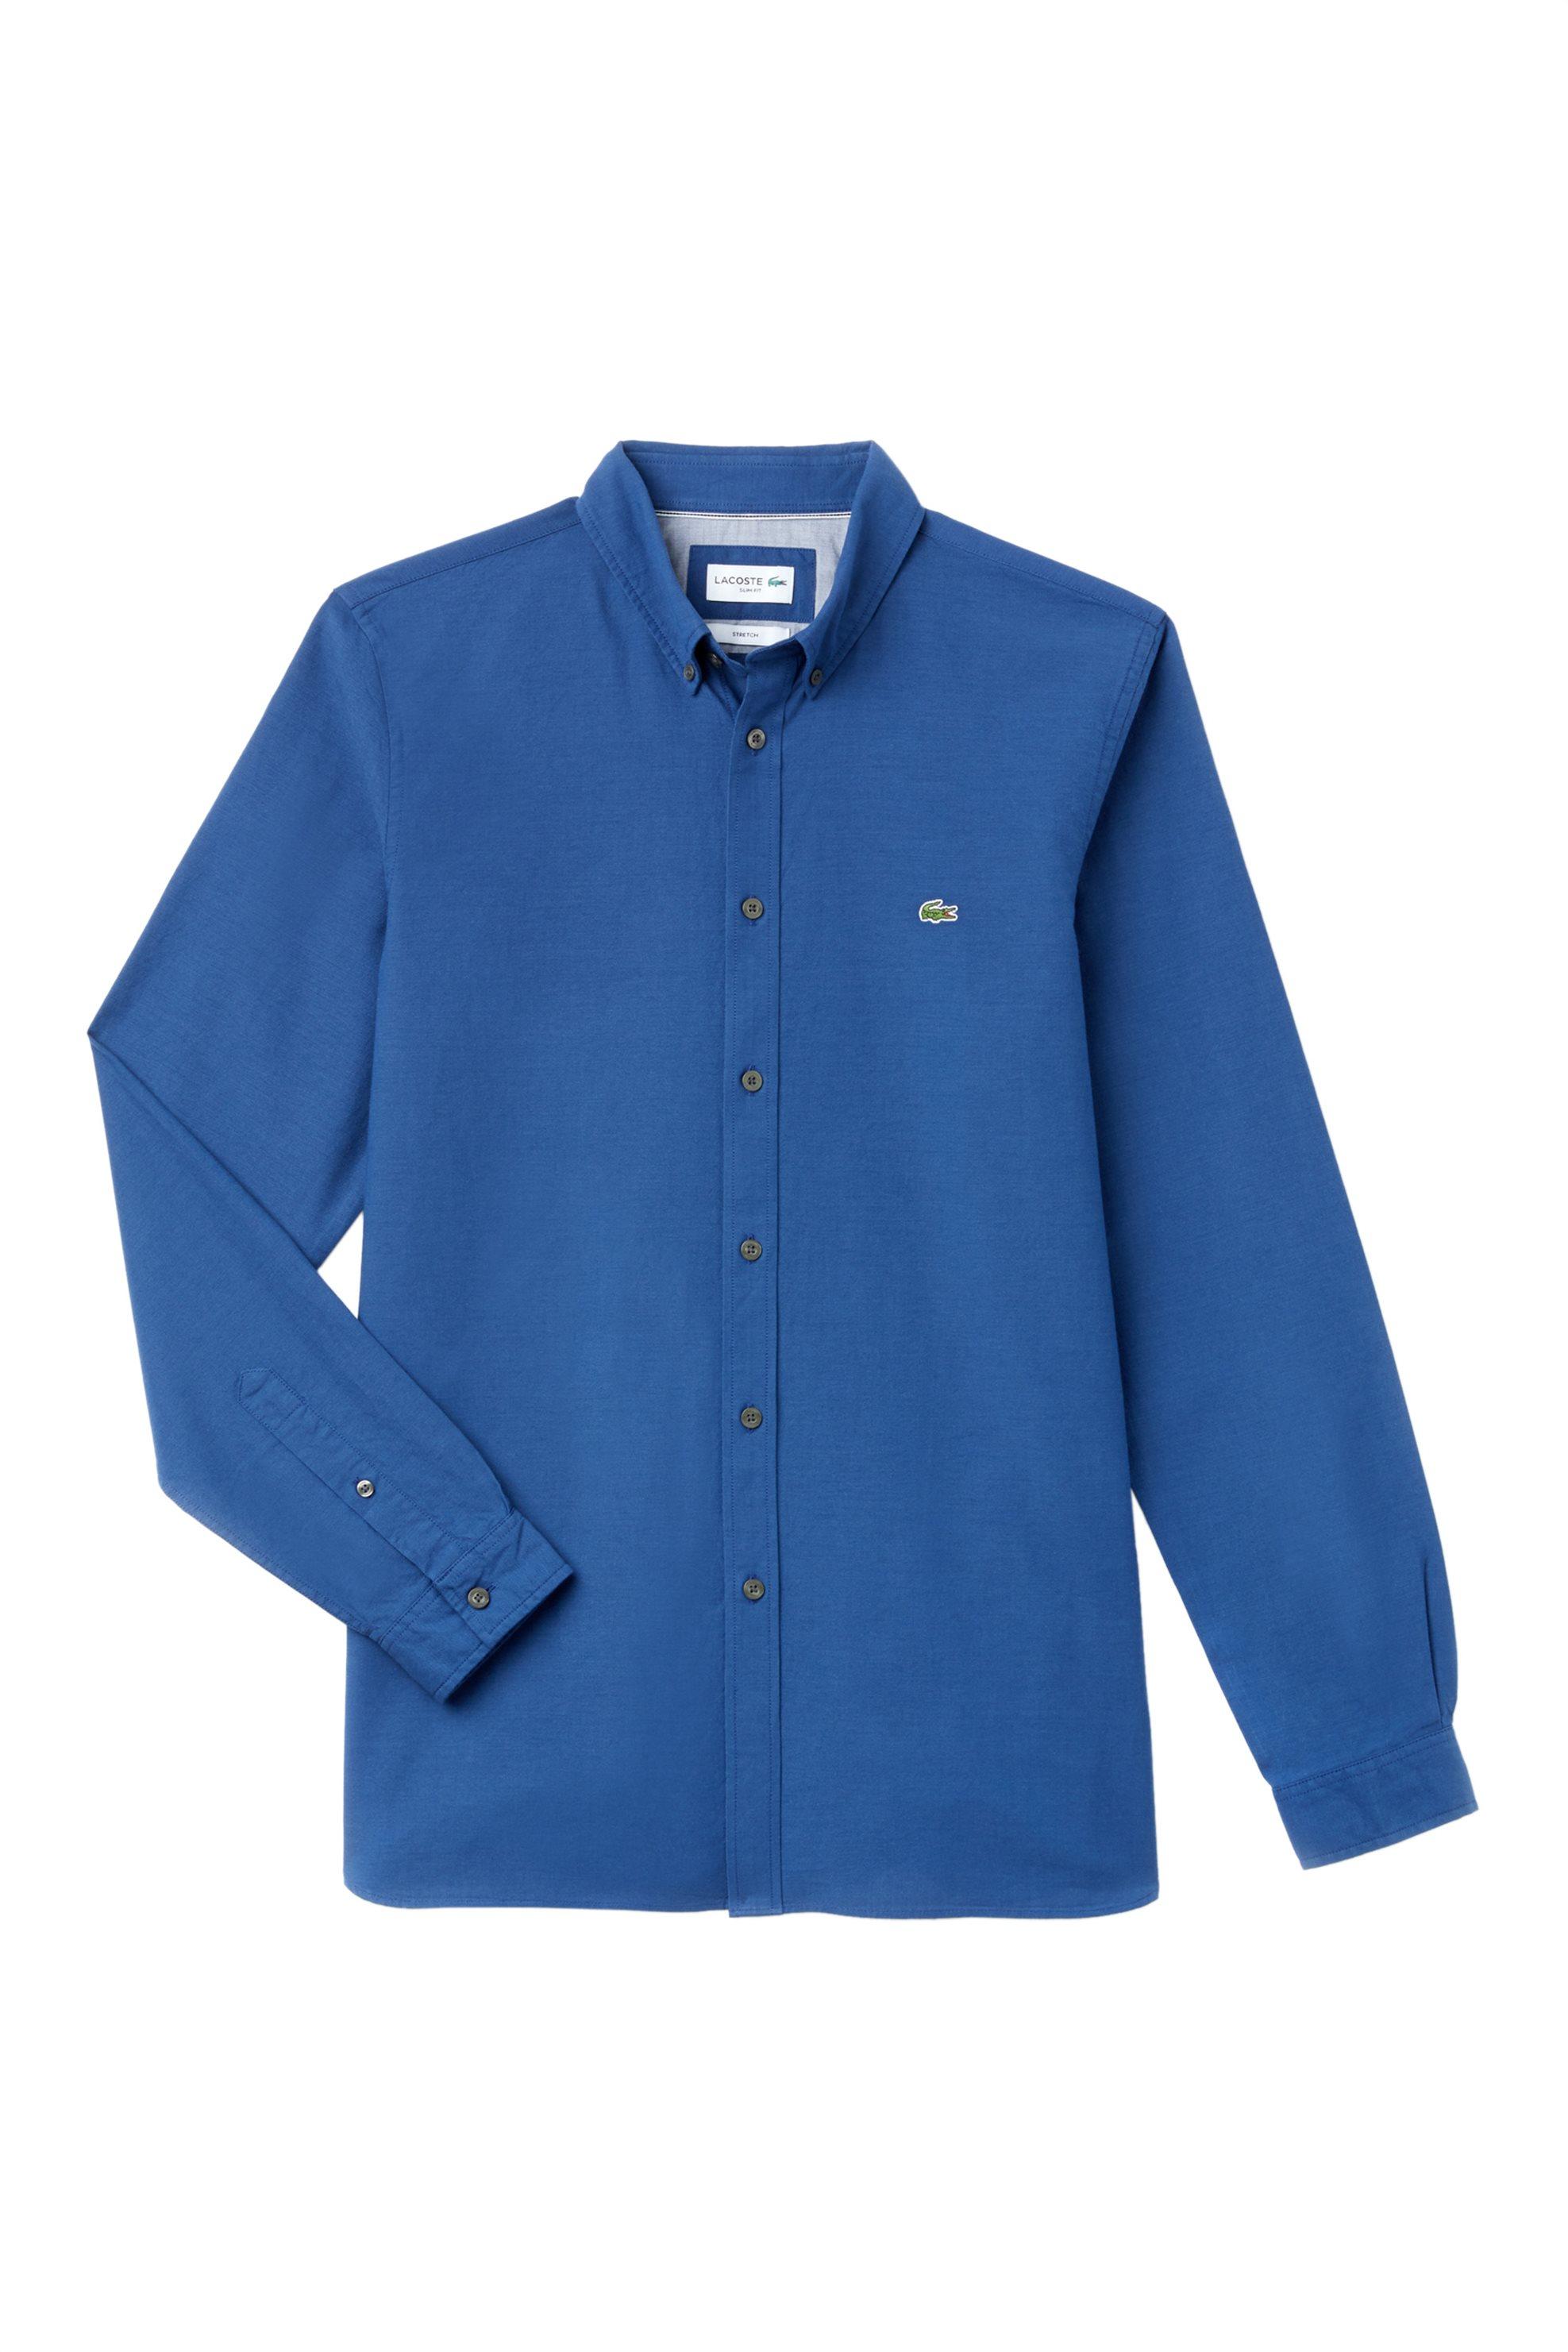 c0ba7a42b5e2 Notos Lacoste ανδρικό πουκάμισο μονόχρωμο slim fit - CH0763 - Μπλε Ηλεκτρίκ